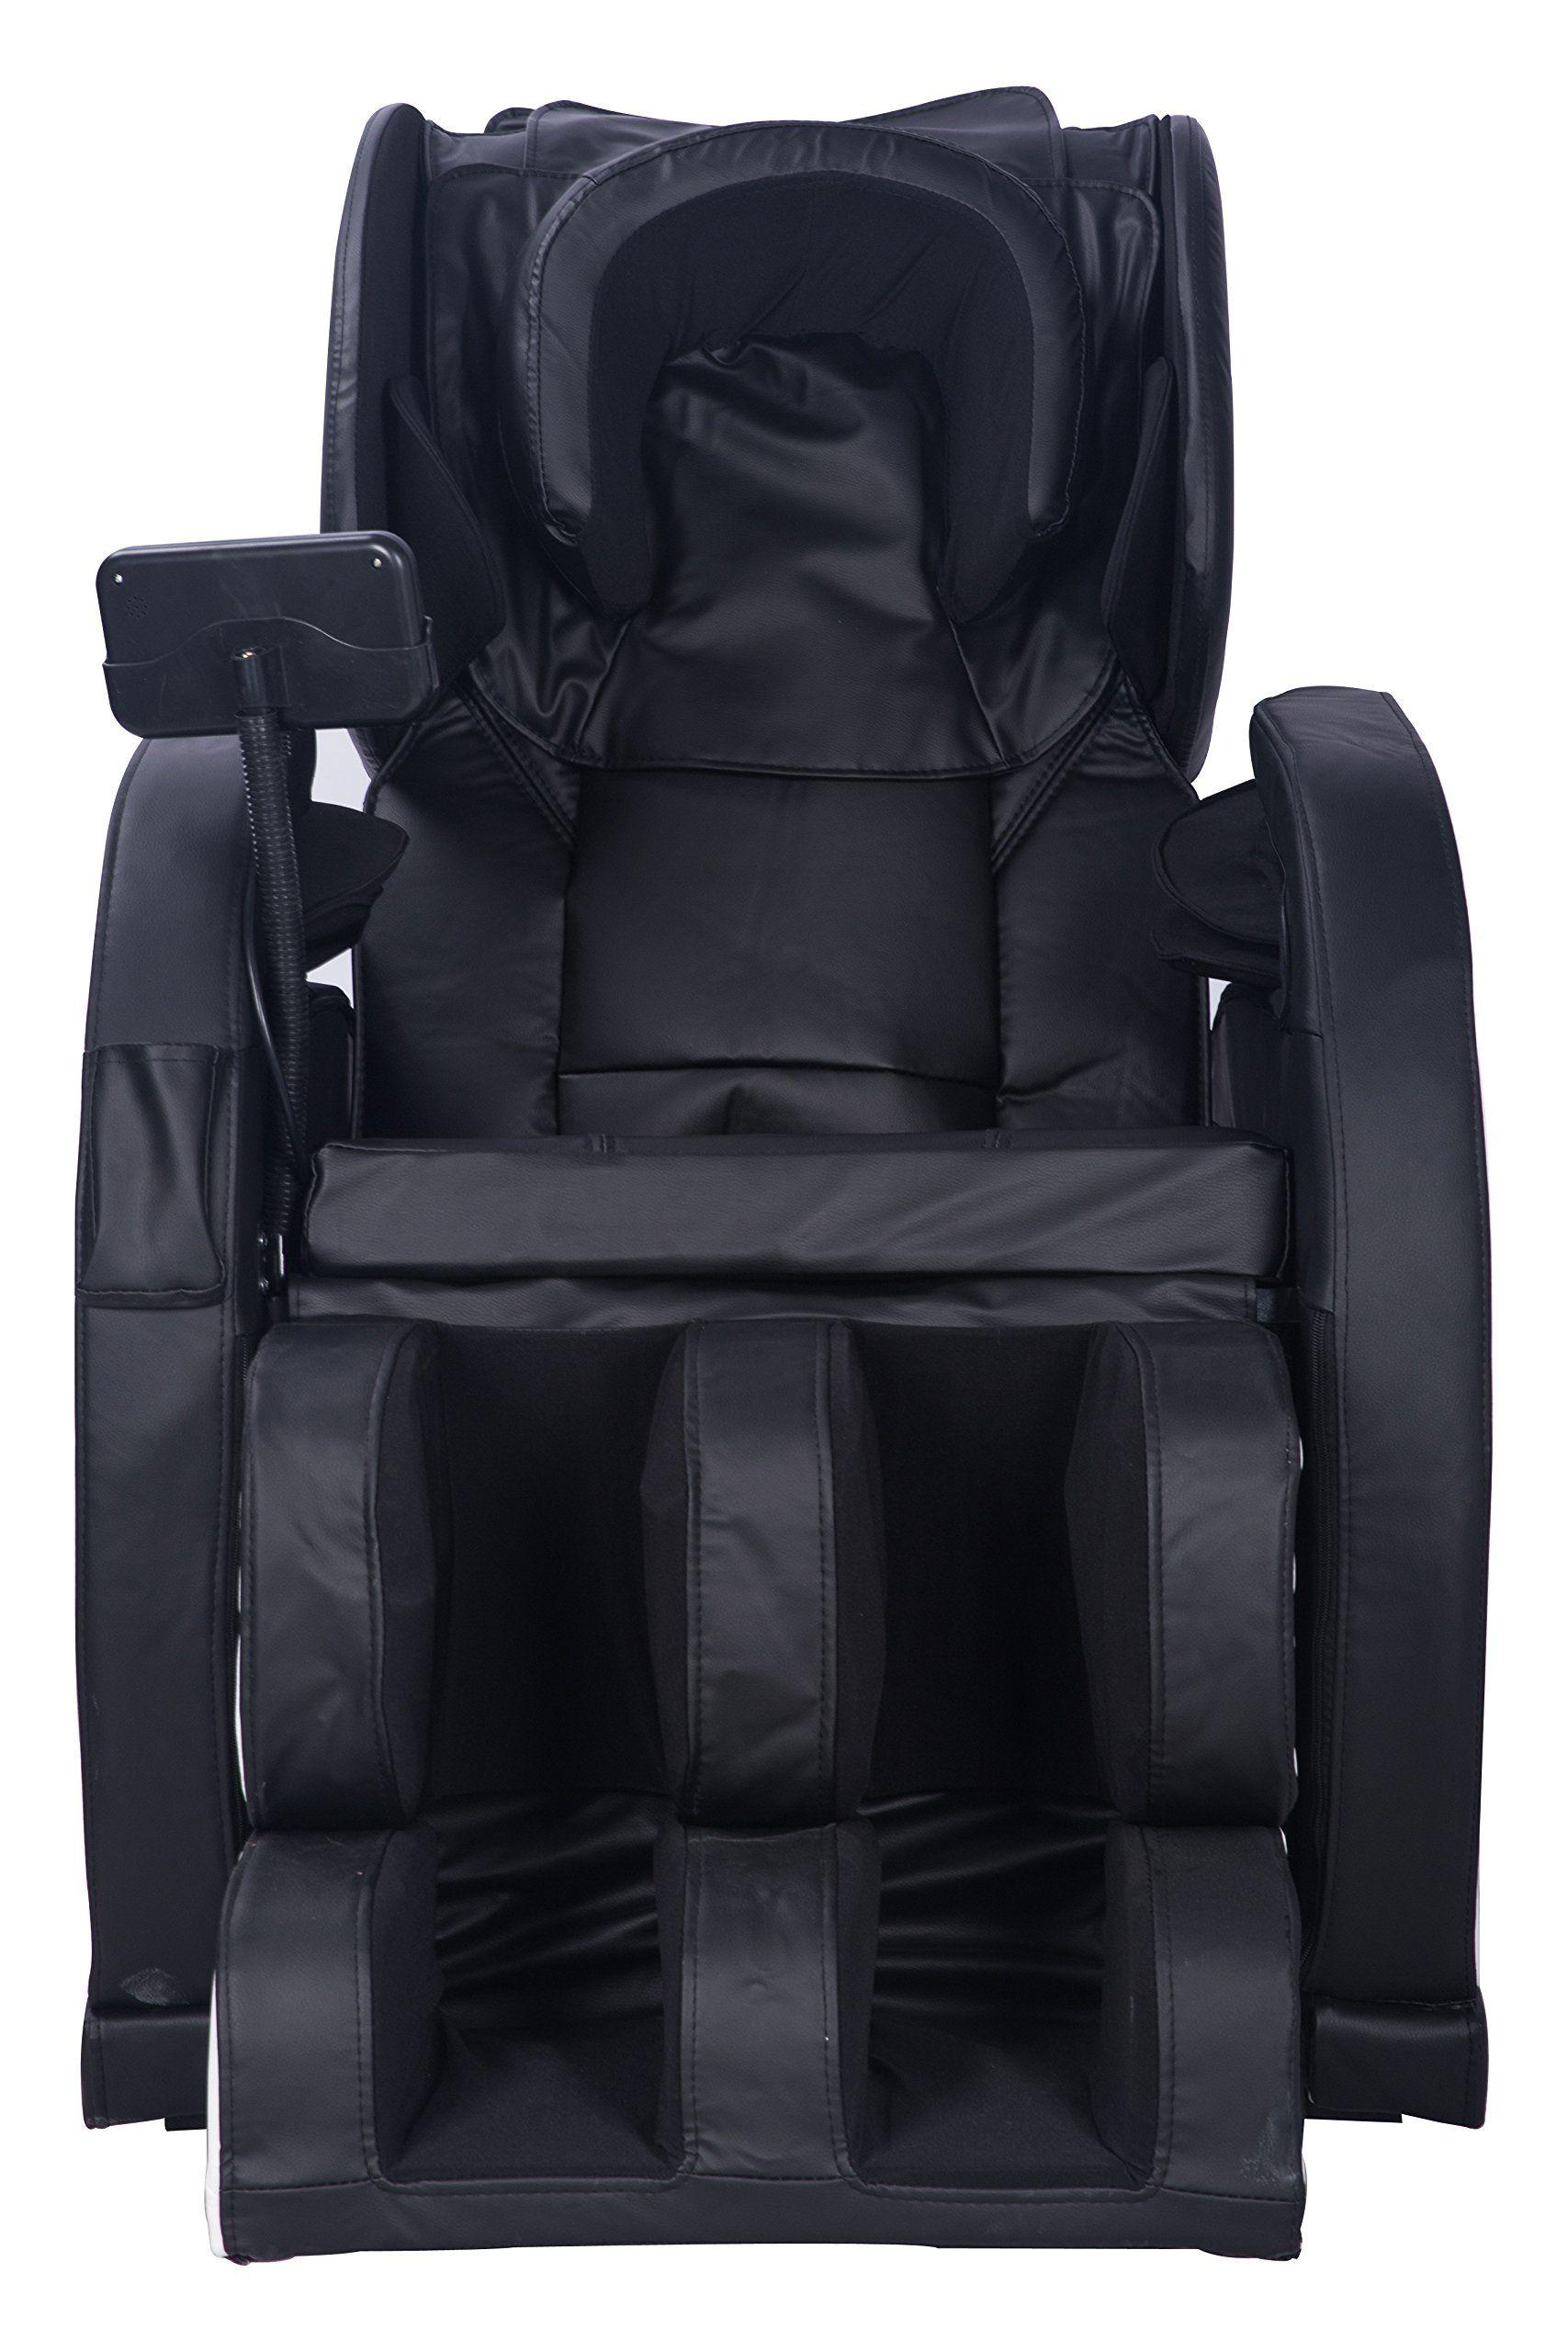 Electric Massage Chair Fullbody Shiatsu Recliner